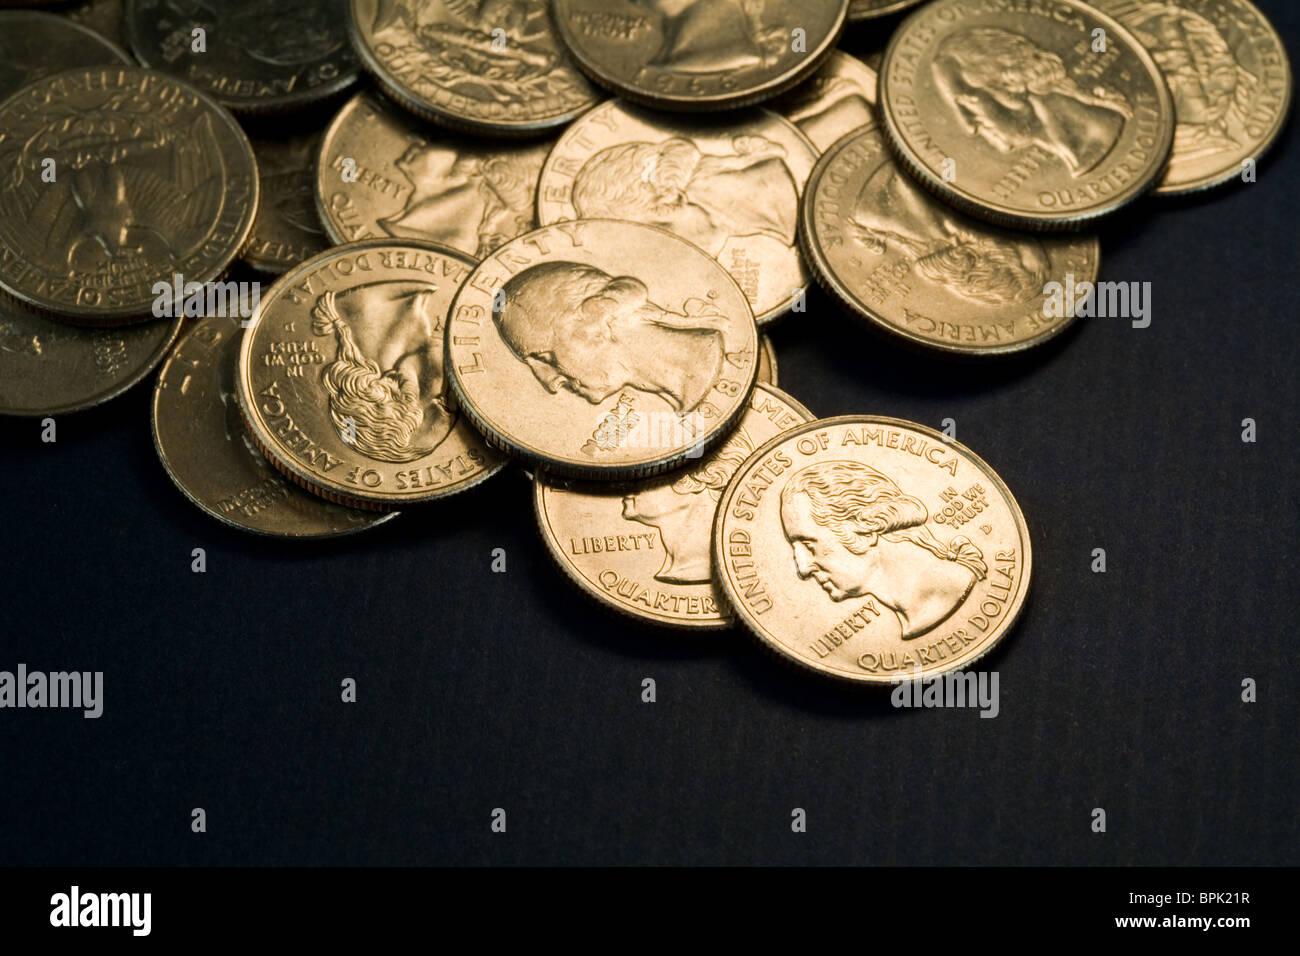 US Coins close up shot - Stock Image